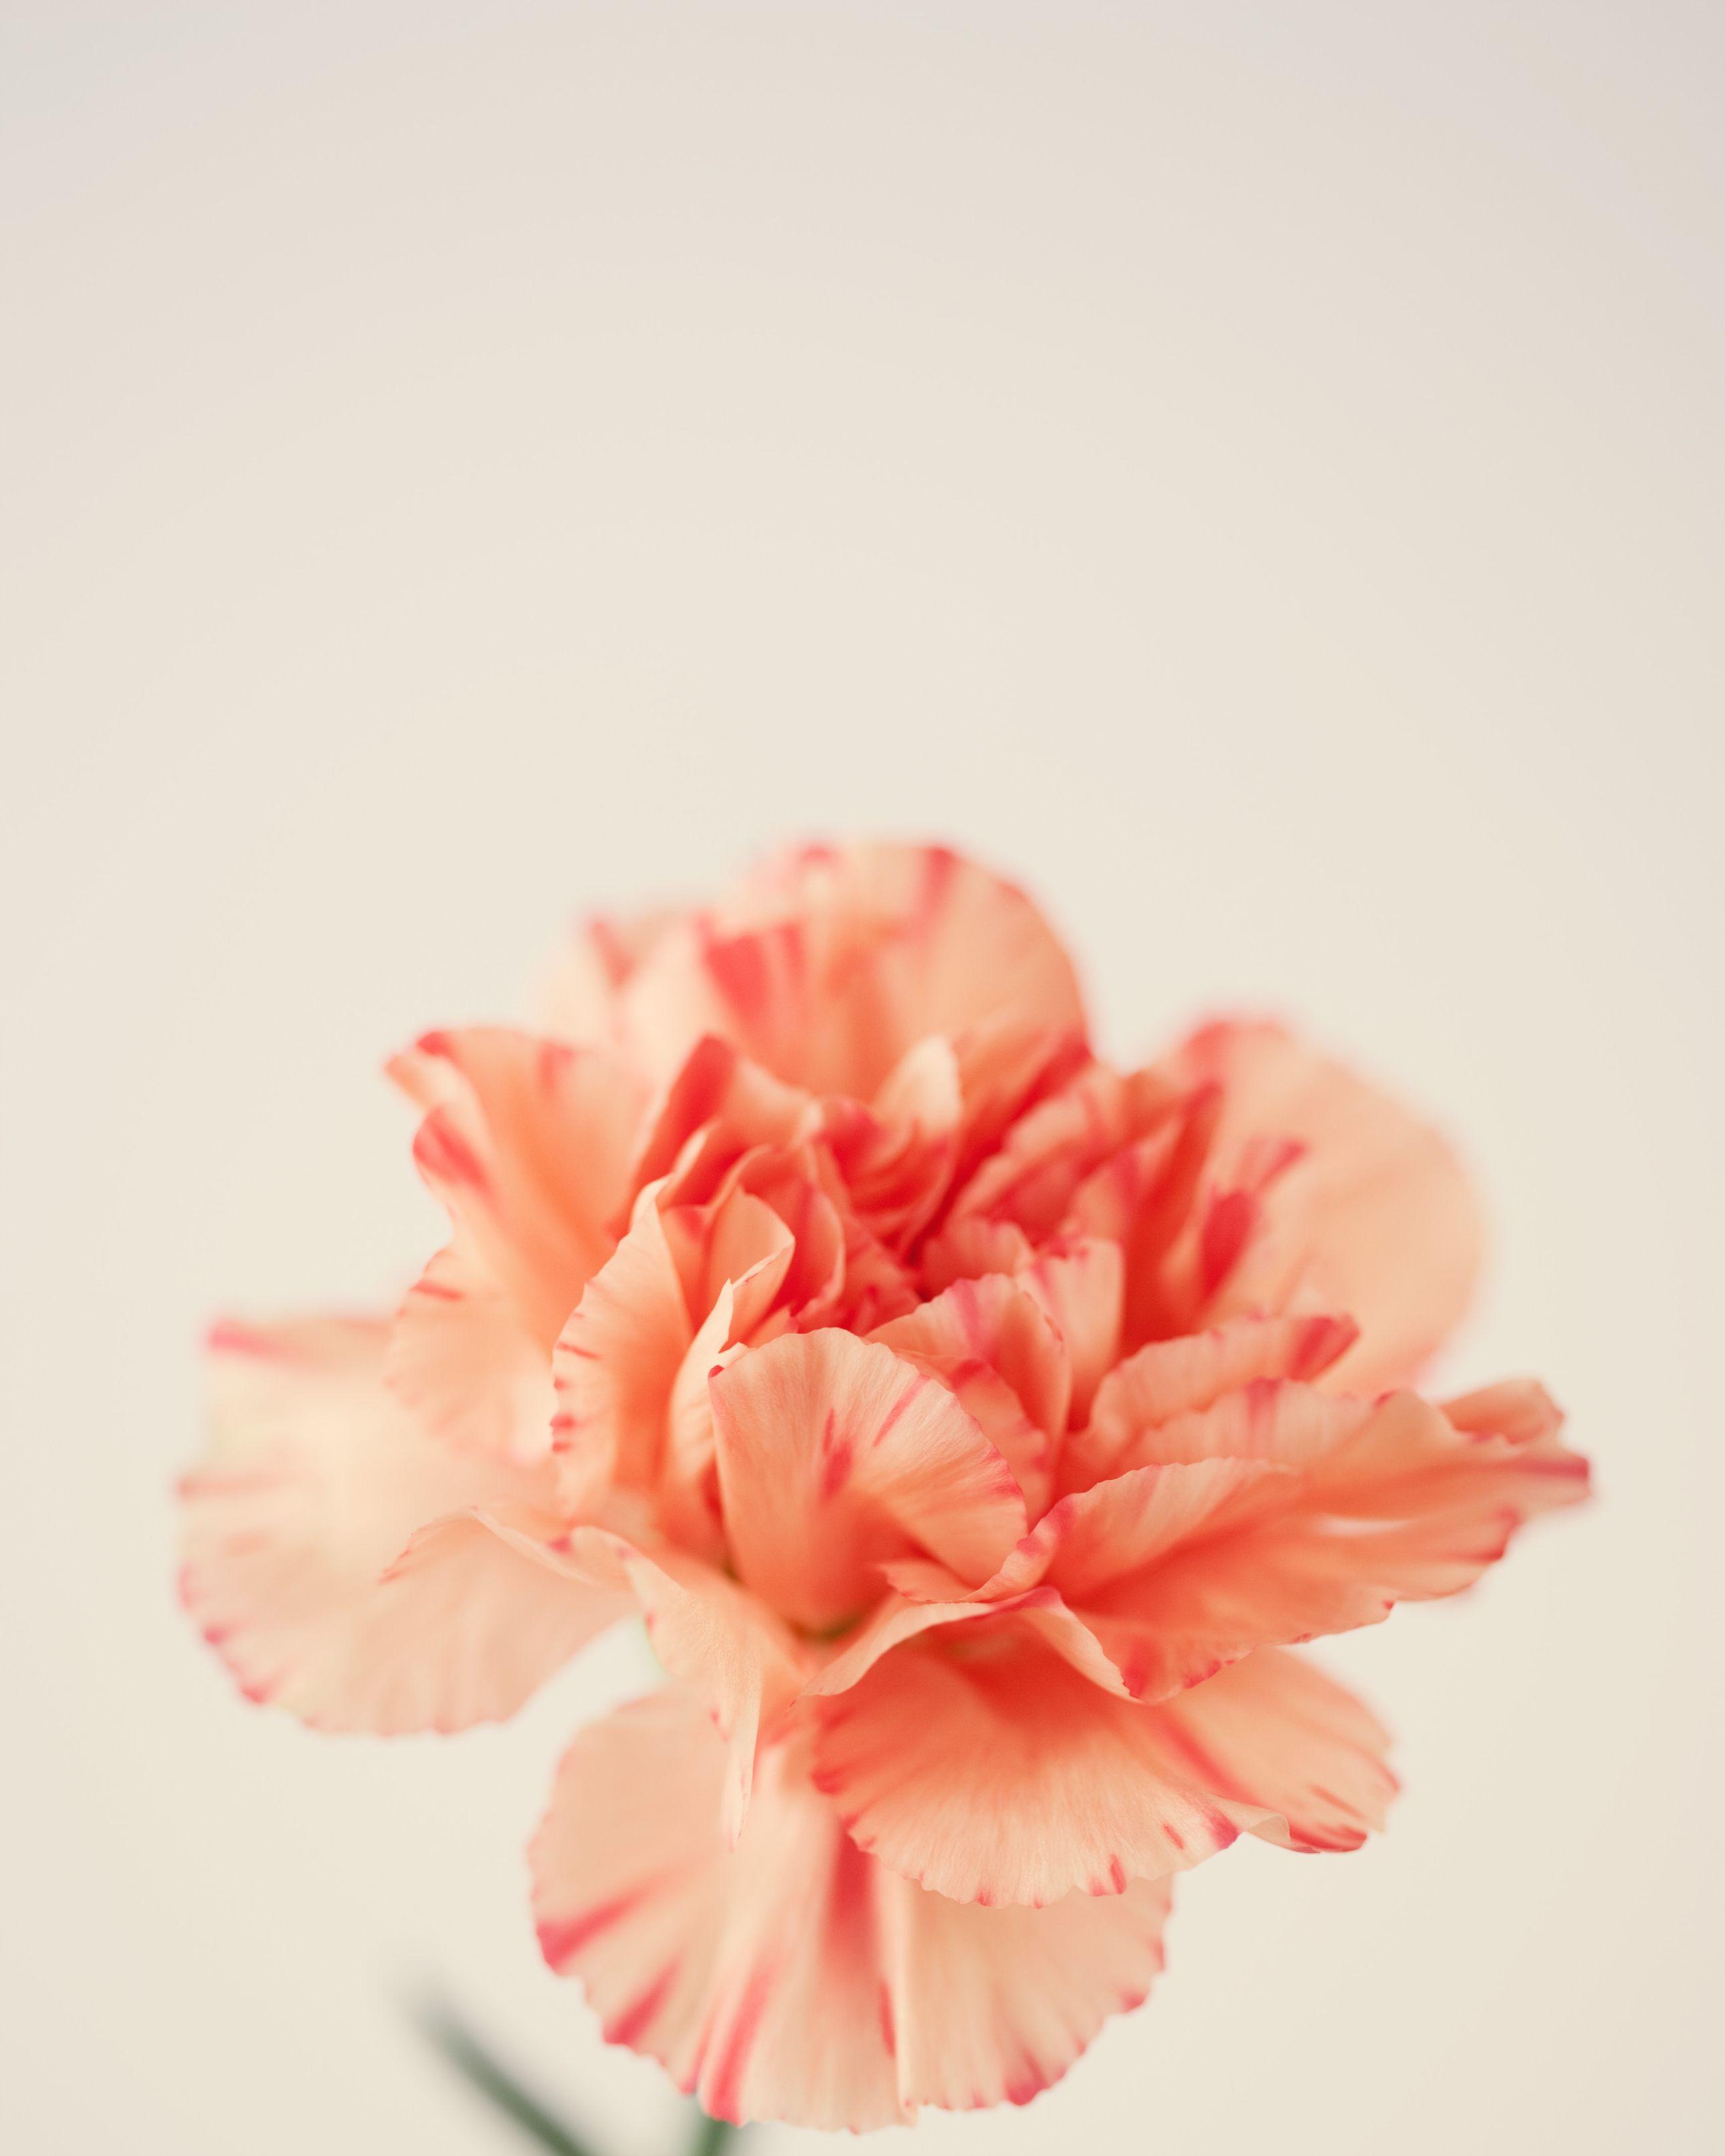 Carnation, studio shot